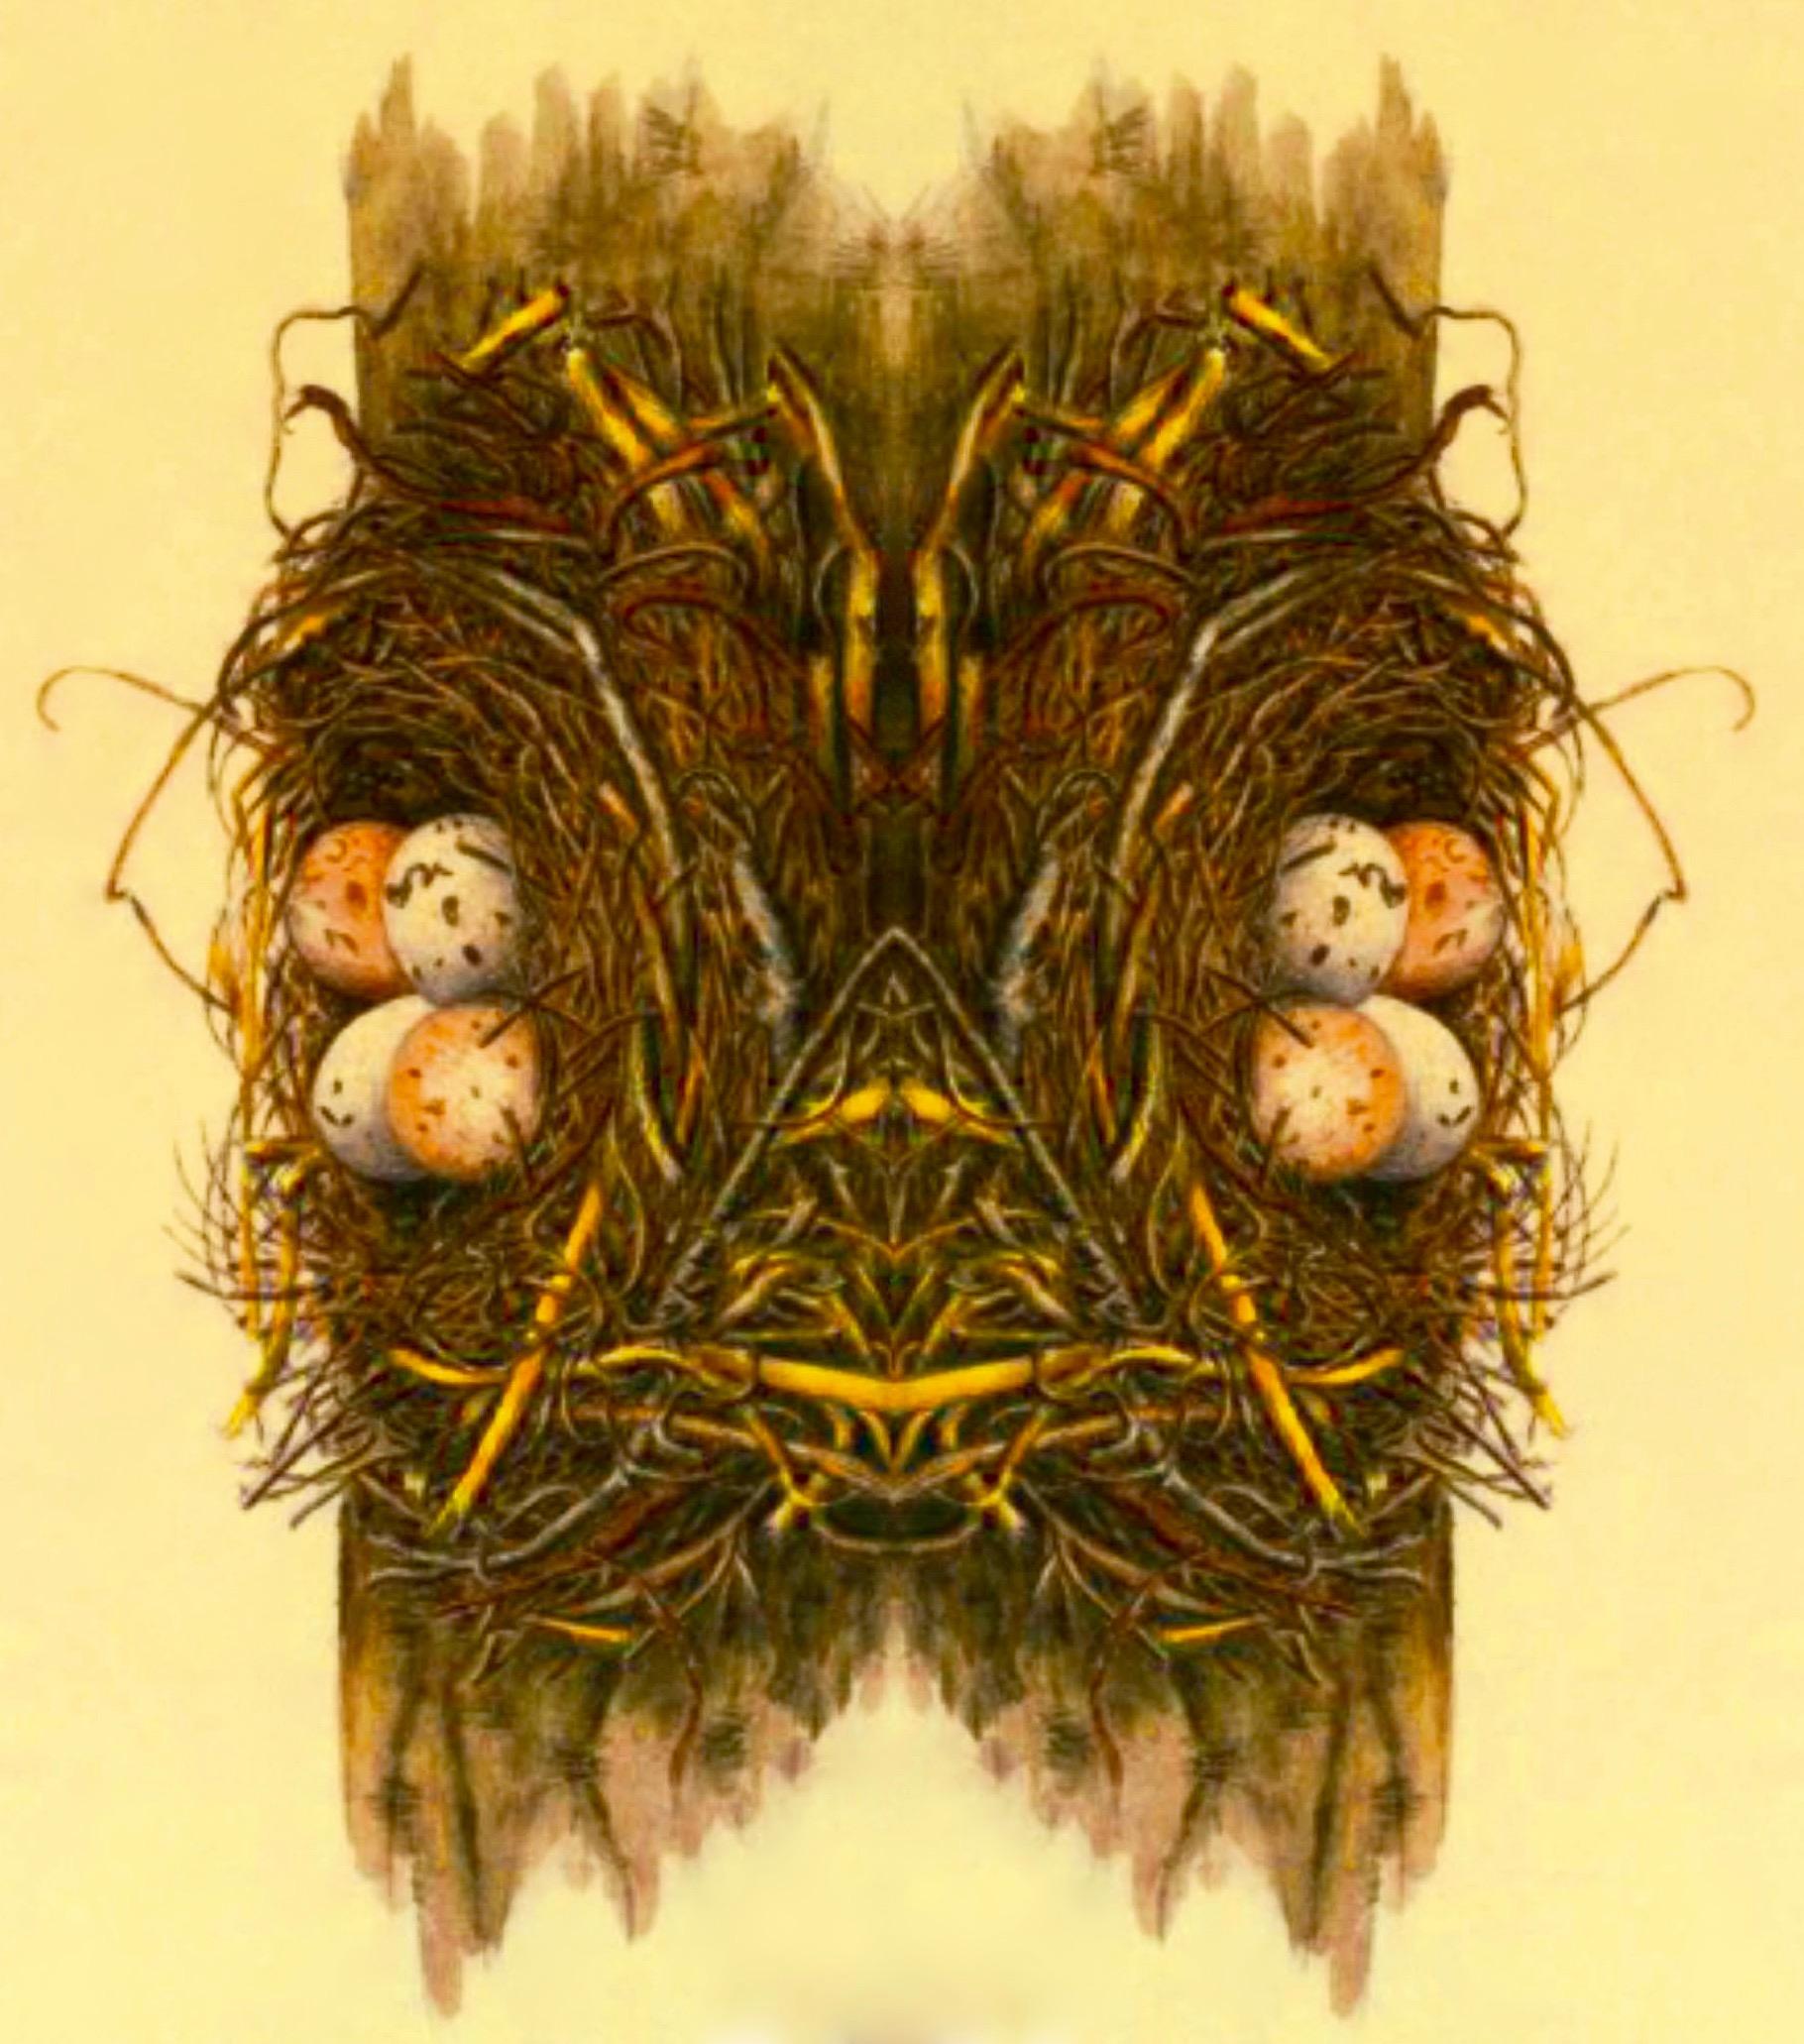 Artwork - Bill Wolak - 4 Wishing for More .jpg